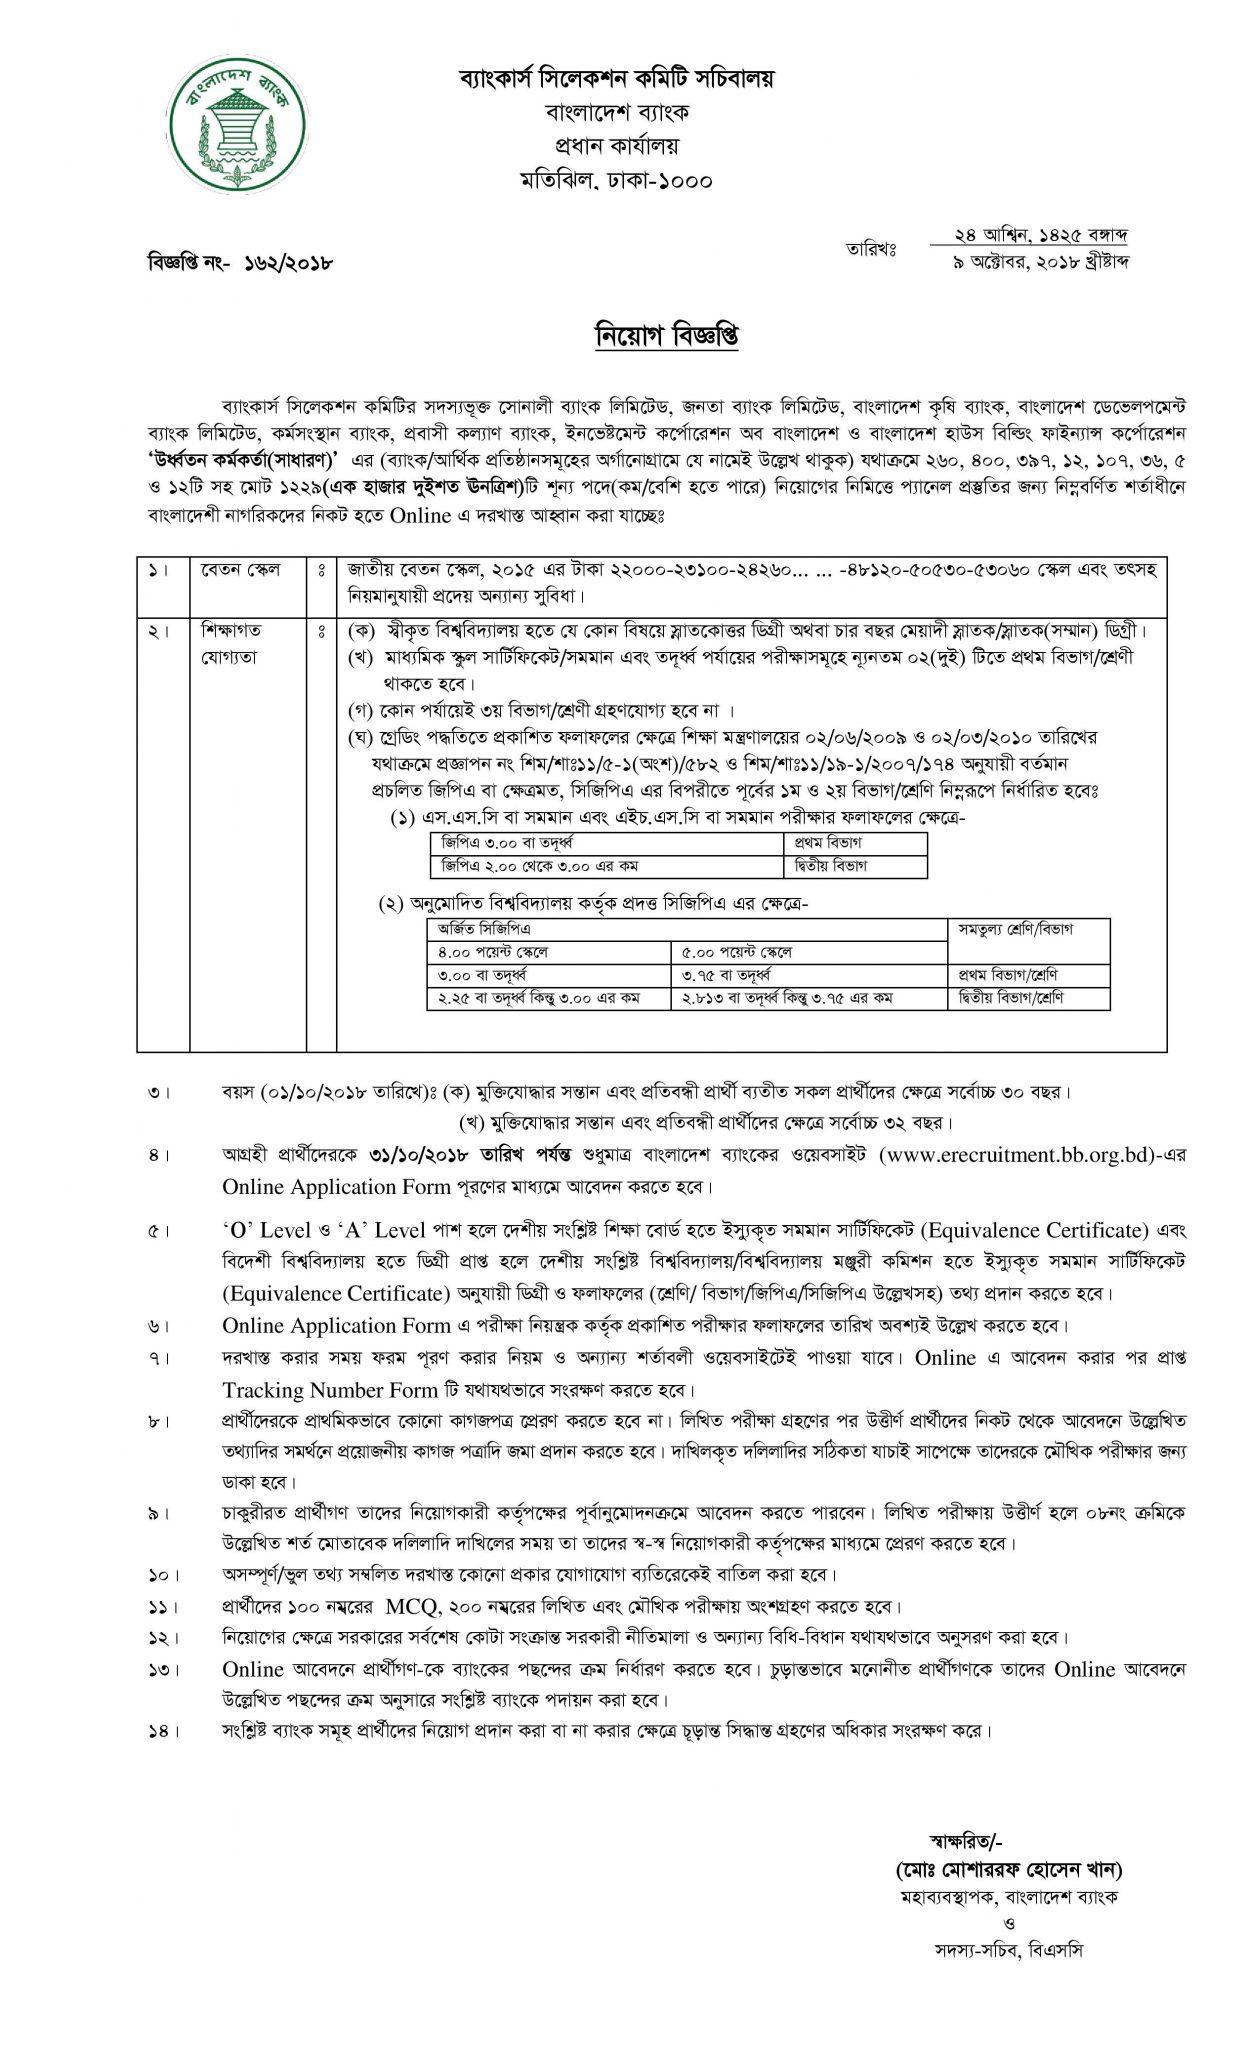 Bangladesh House Building Finance Corporation (BHBFC) Job Circular 2018